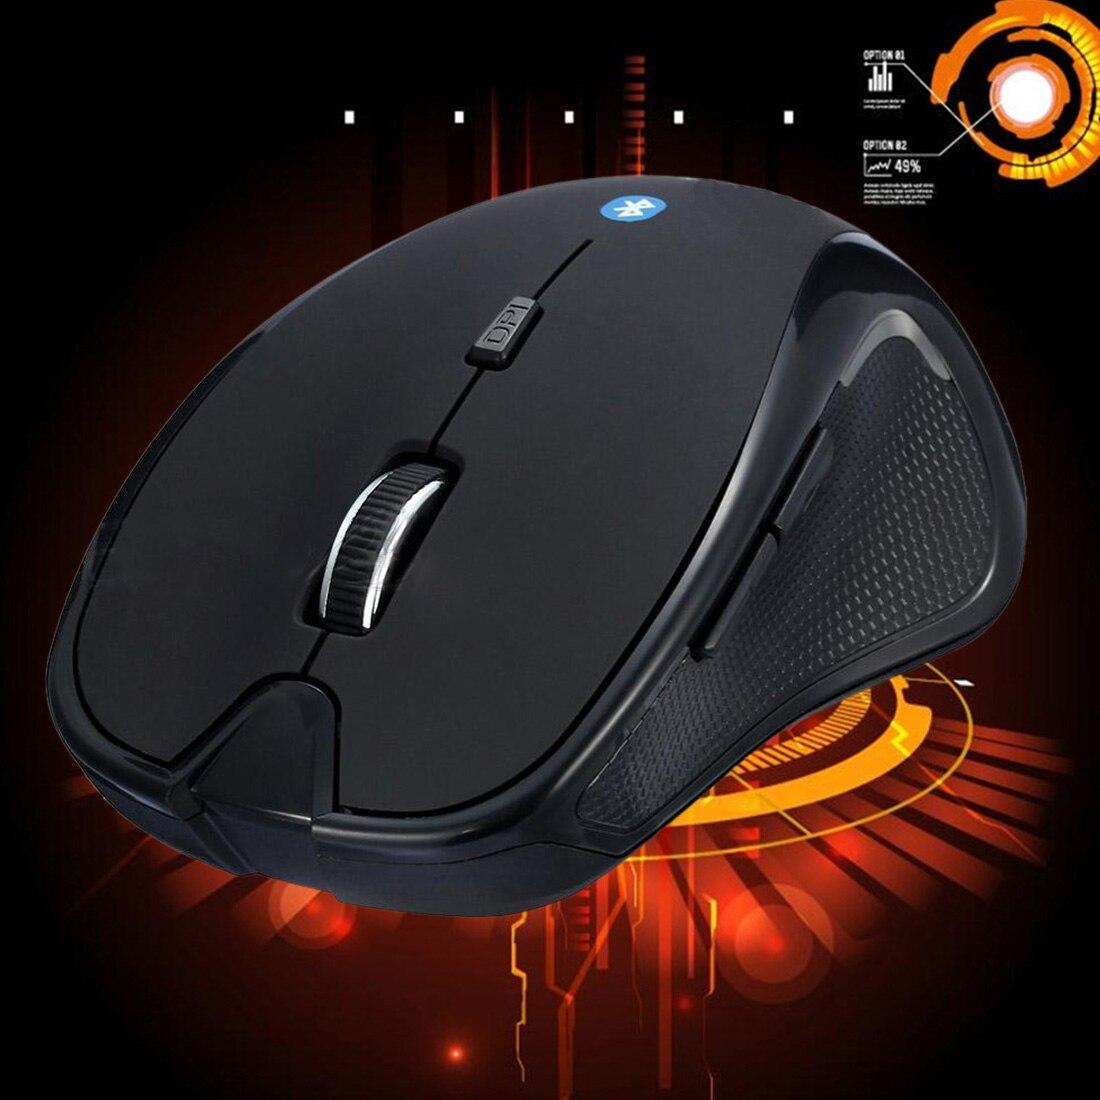 Etmakit Hot Sale Fashion Mini Wireless Bluetooth 3.0 6D 1600DPI Optical Gaming Mouse Mice Black Laptop PC Computer Peripherals